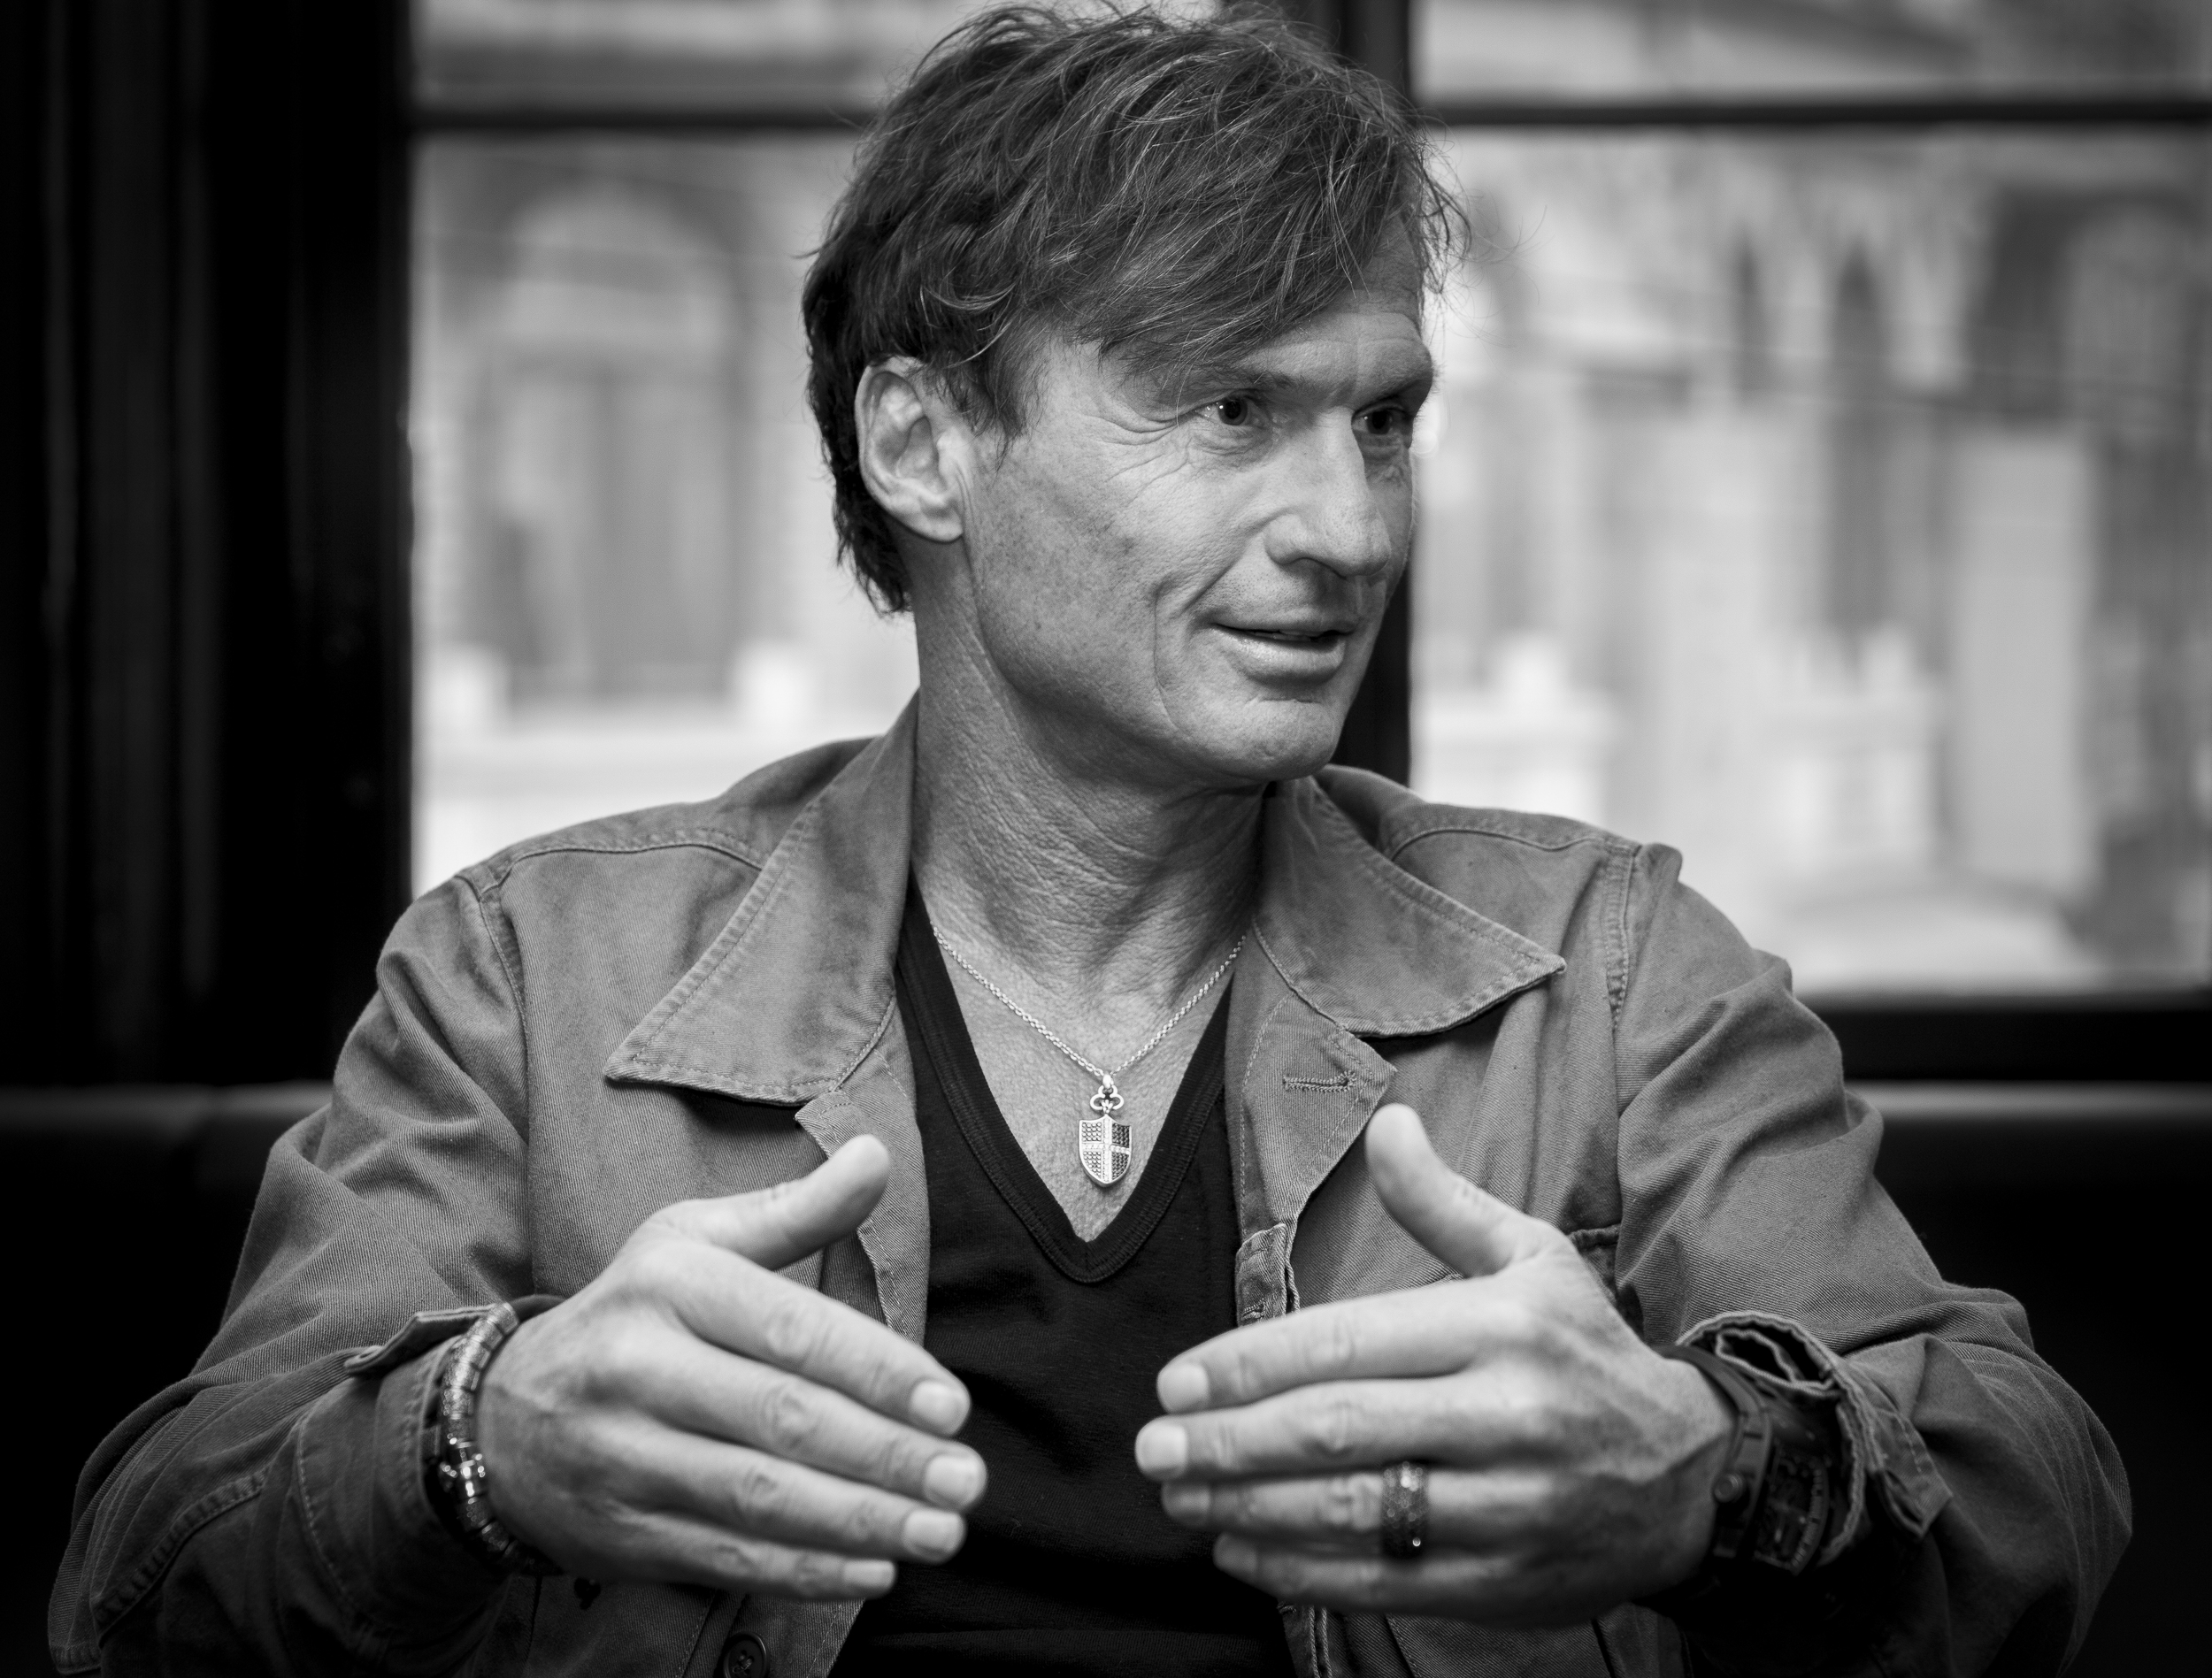 Hotel owner and billionaire Petter Stordalen